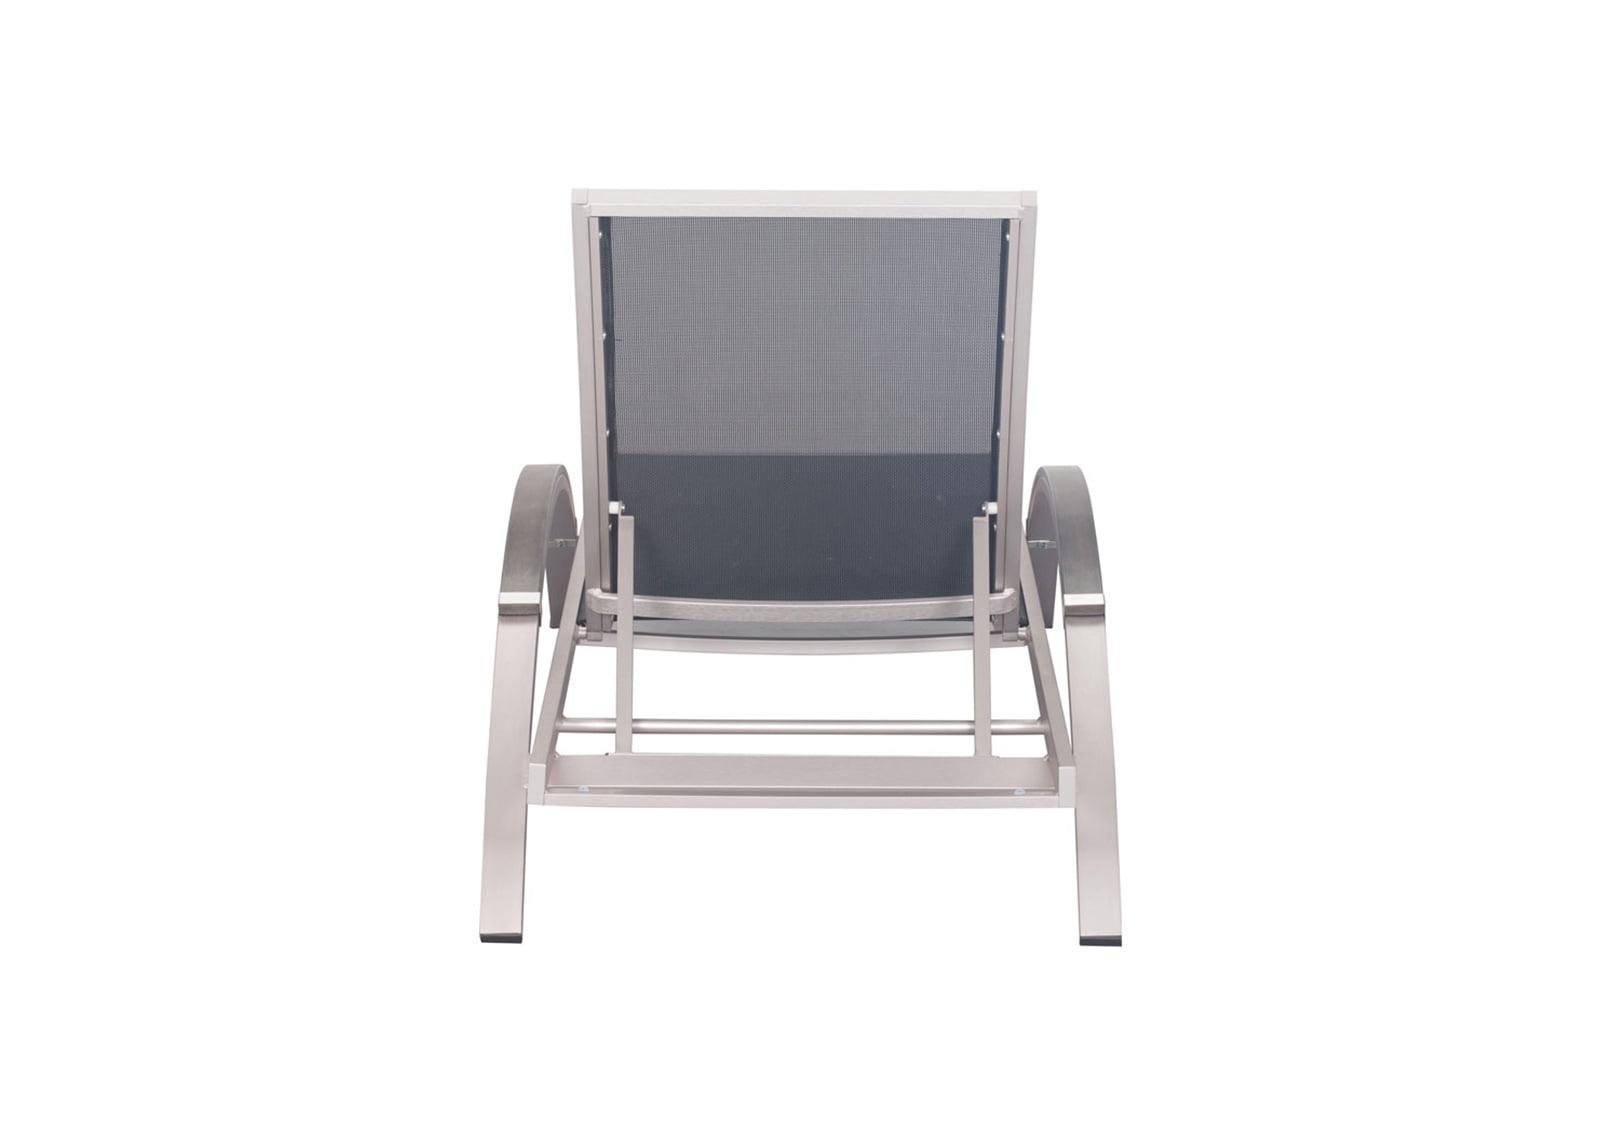 Metropolitan chaise lounge brushed aluminum furnishplus for Chaise aluminium